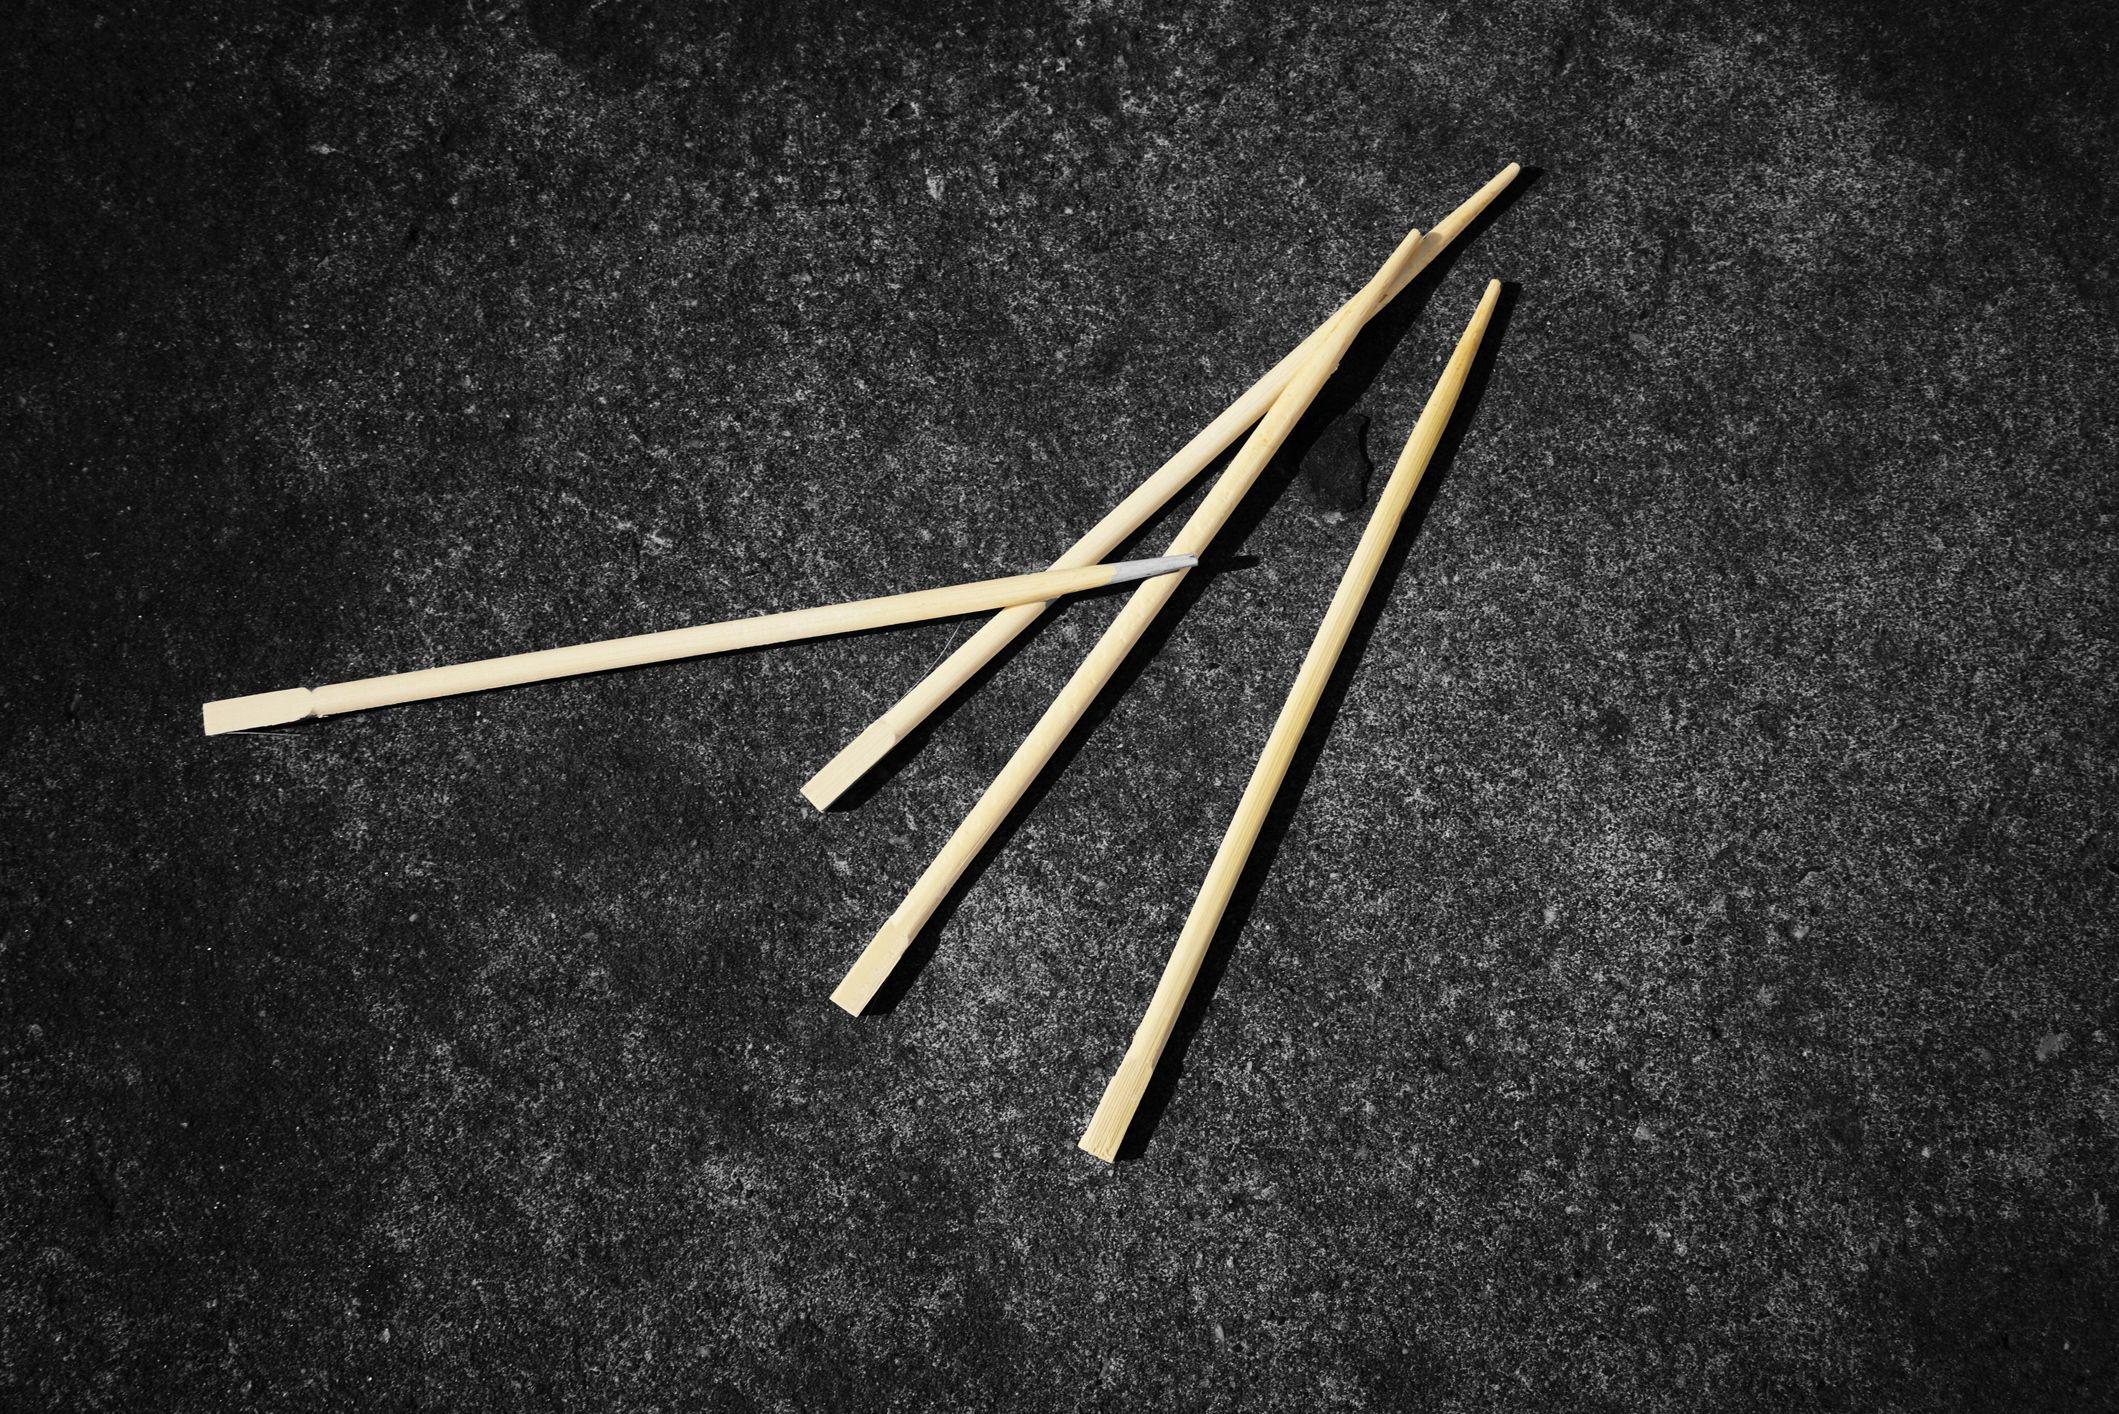 Toothpicks on a dark background